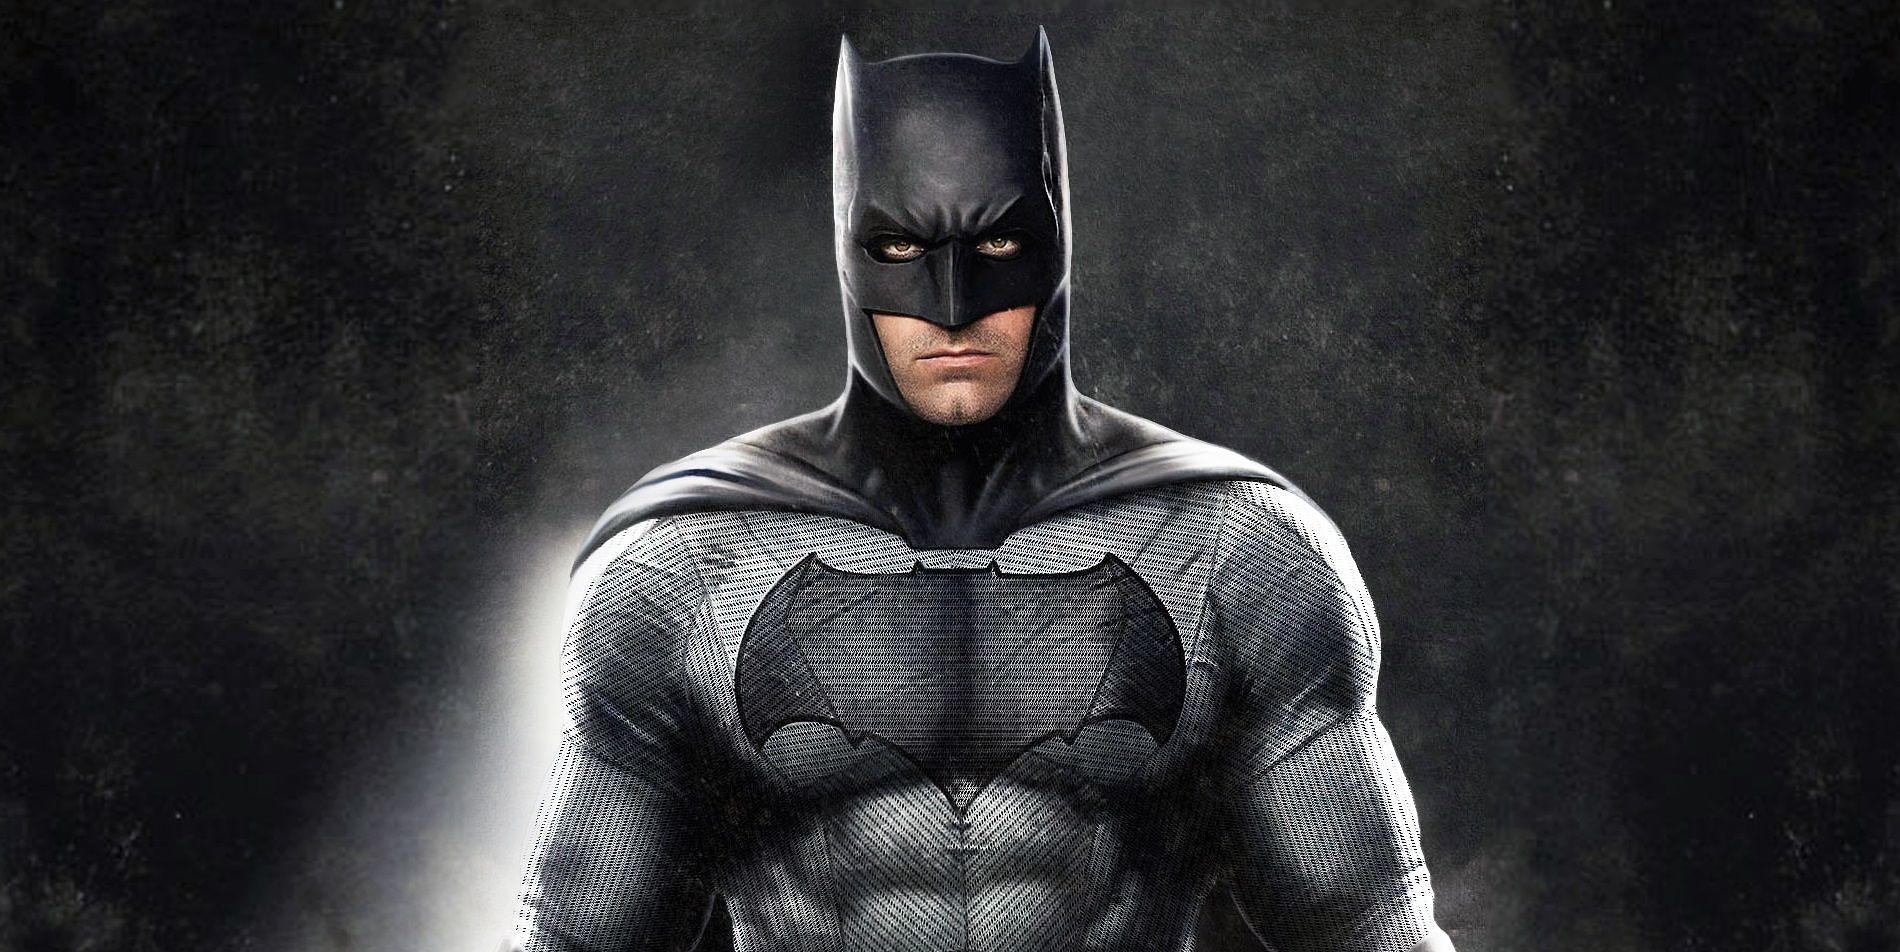 Wallpaper The Lego Batman Movie, The Joker, Robin, - Batman Batman V Superman , HD Wallpaper & Backgrounds